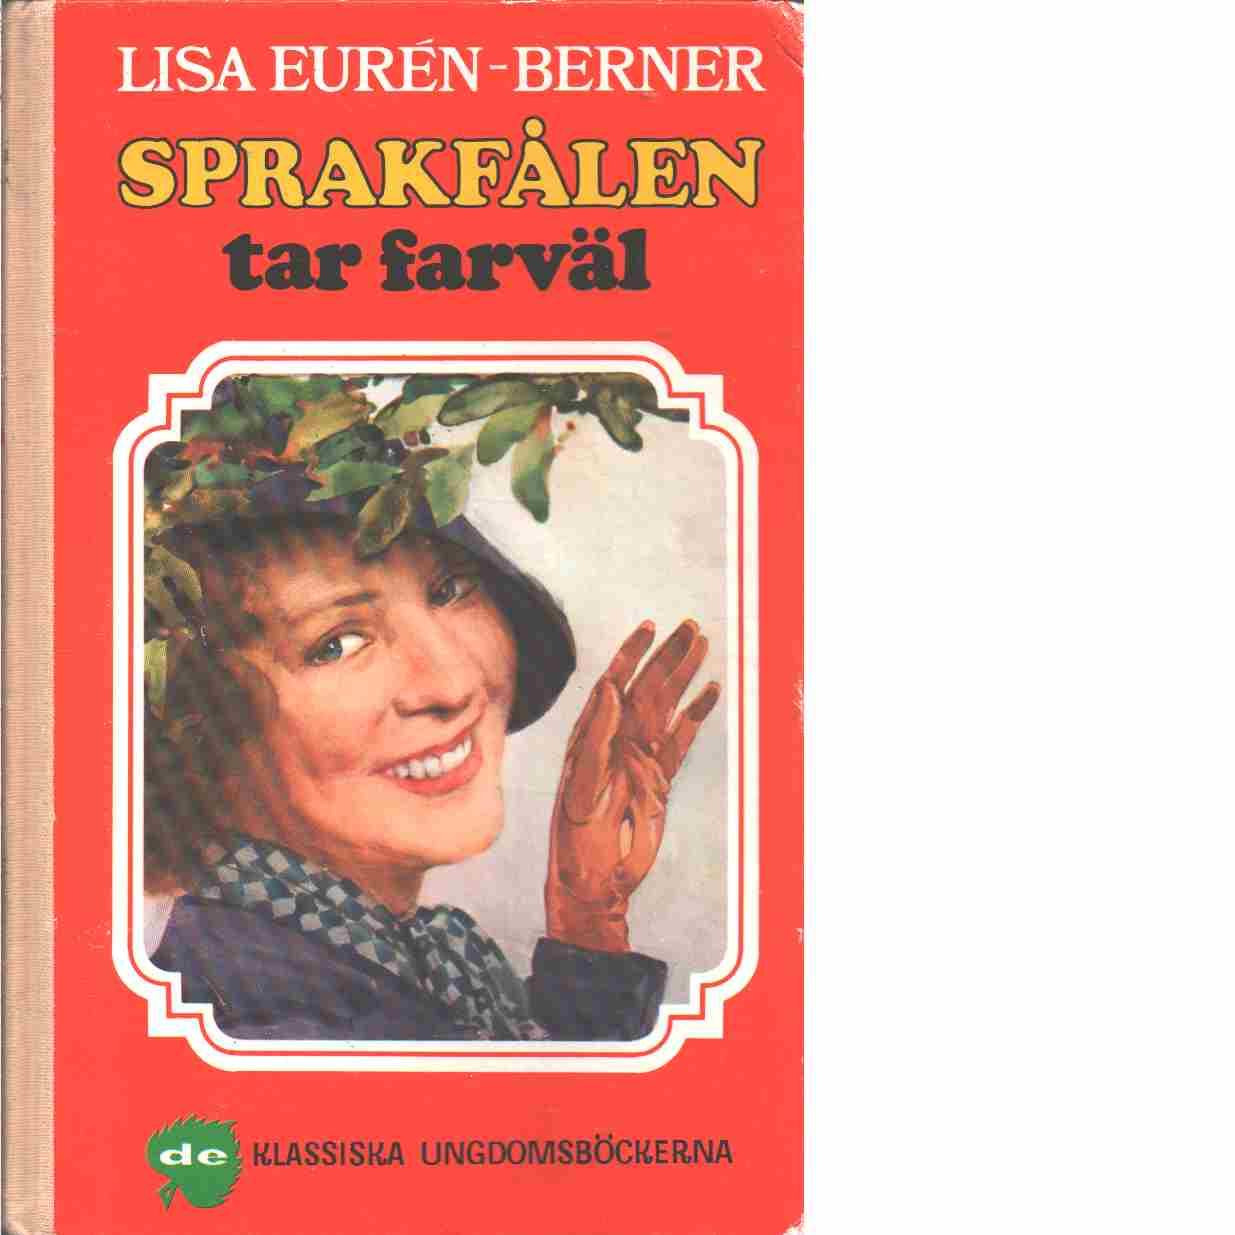 Sprakfålen tar farväl - Eurén-Berner, Lisa